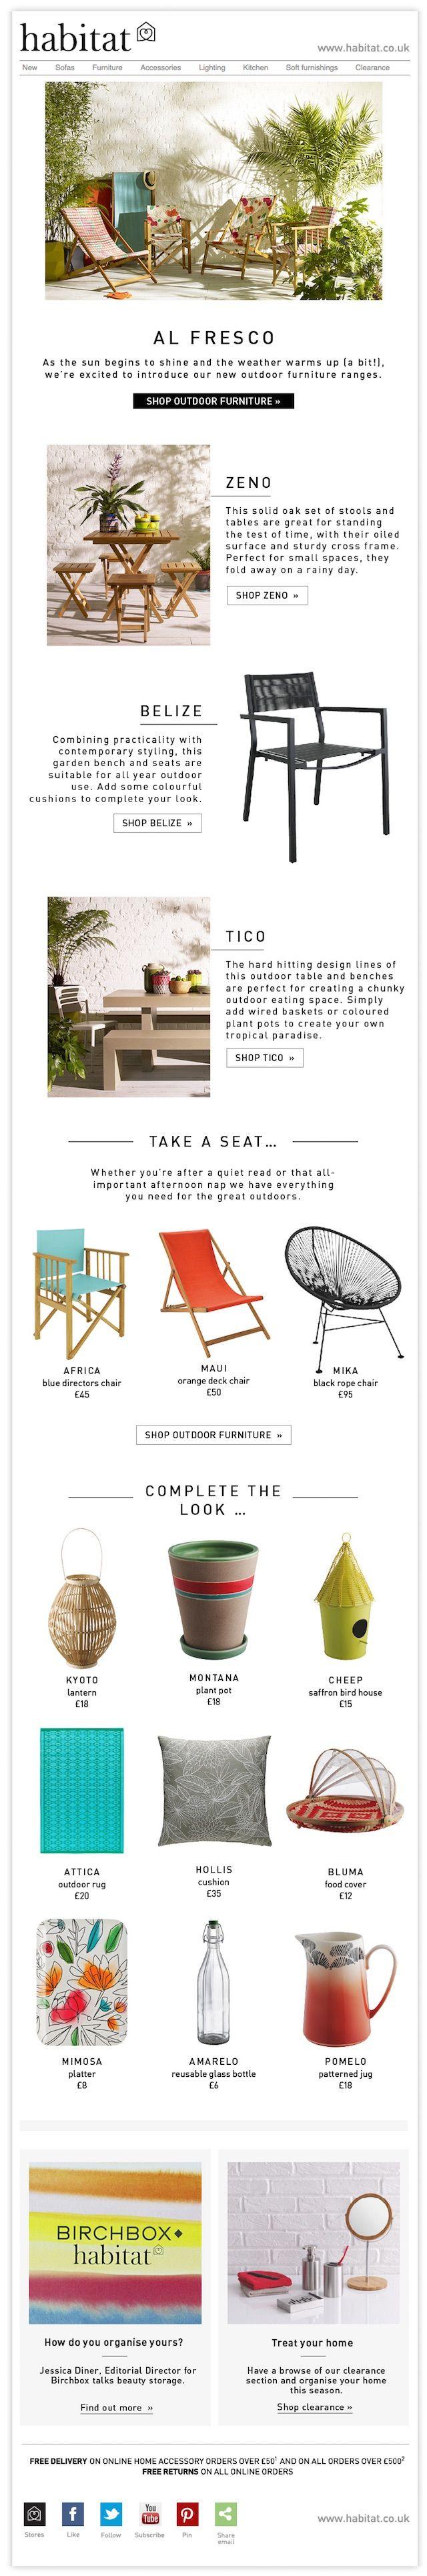 Habitat - NEW outdoor furniture + sunshine - newsletter example